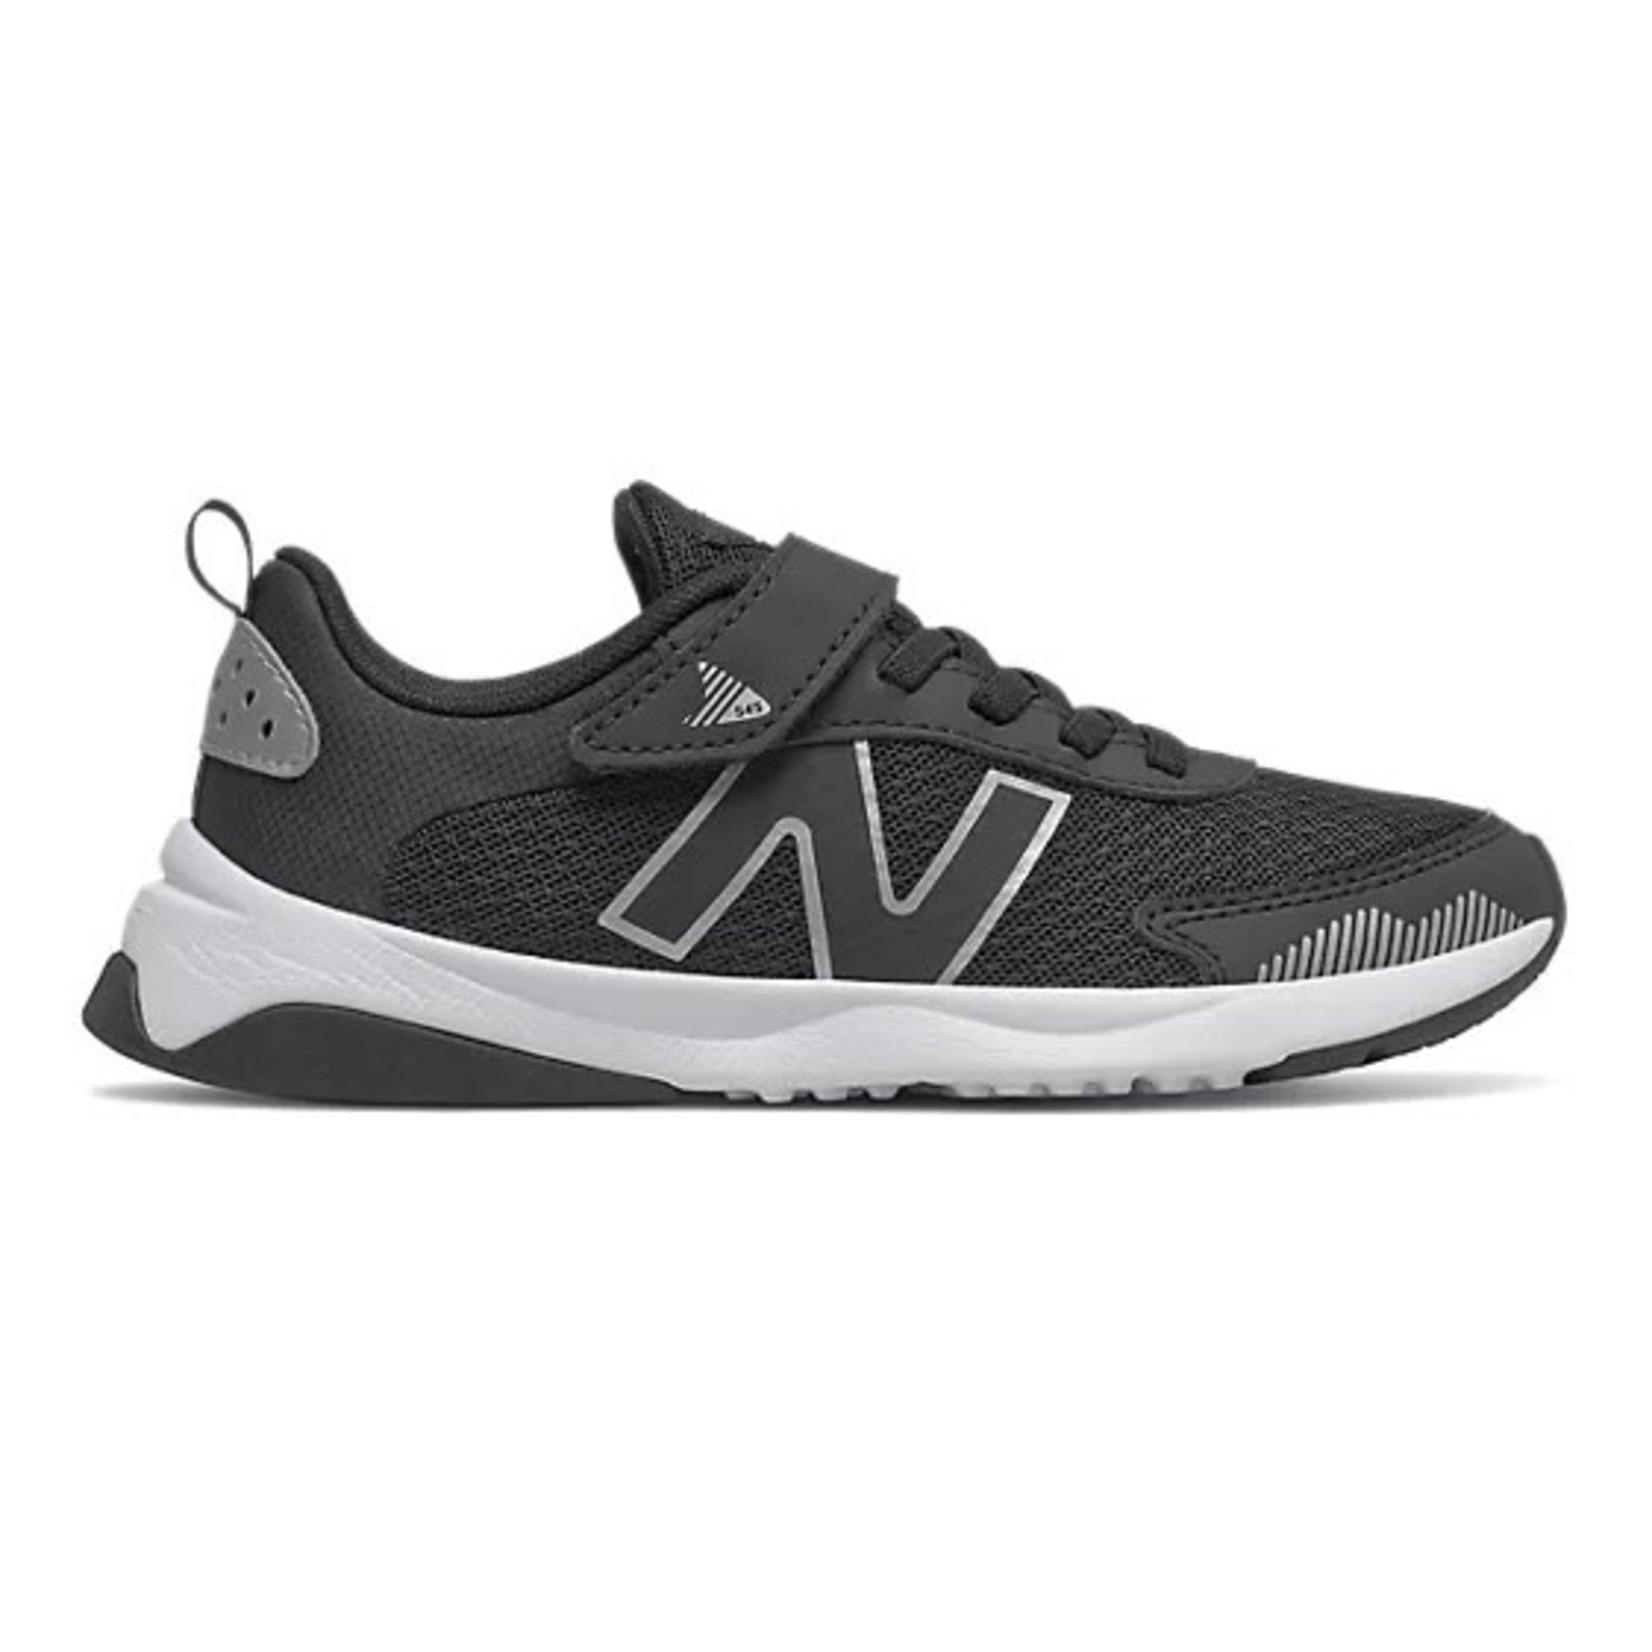 New Balance New Balance Running Shoes, 545, BPS, Boys